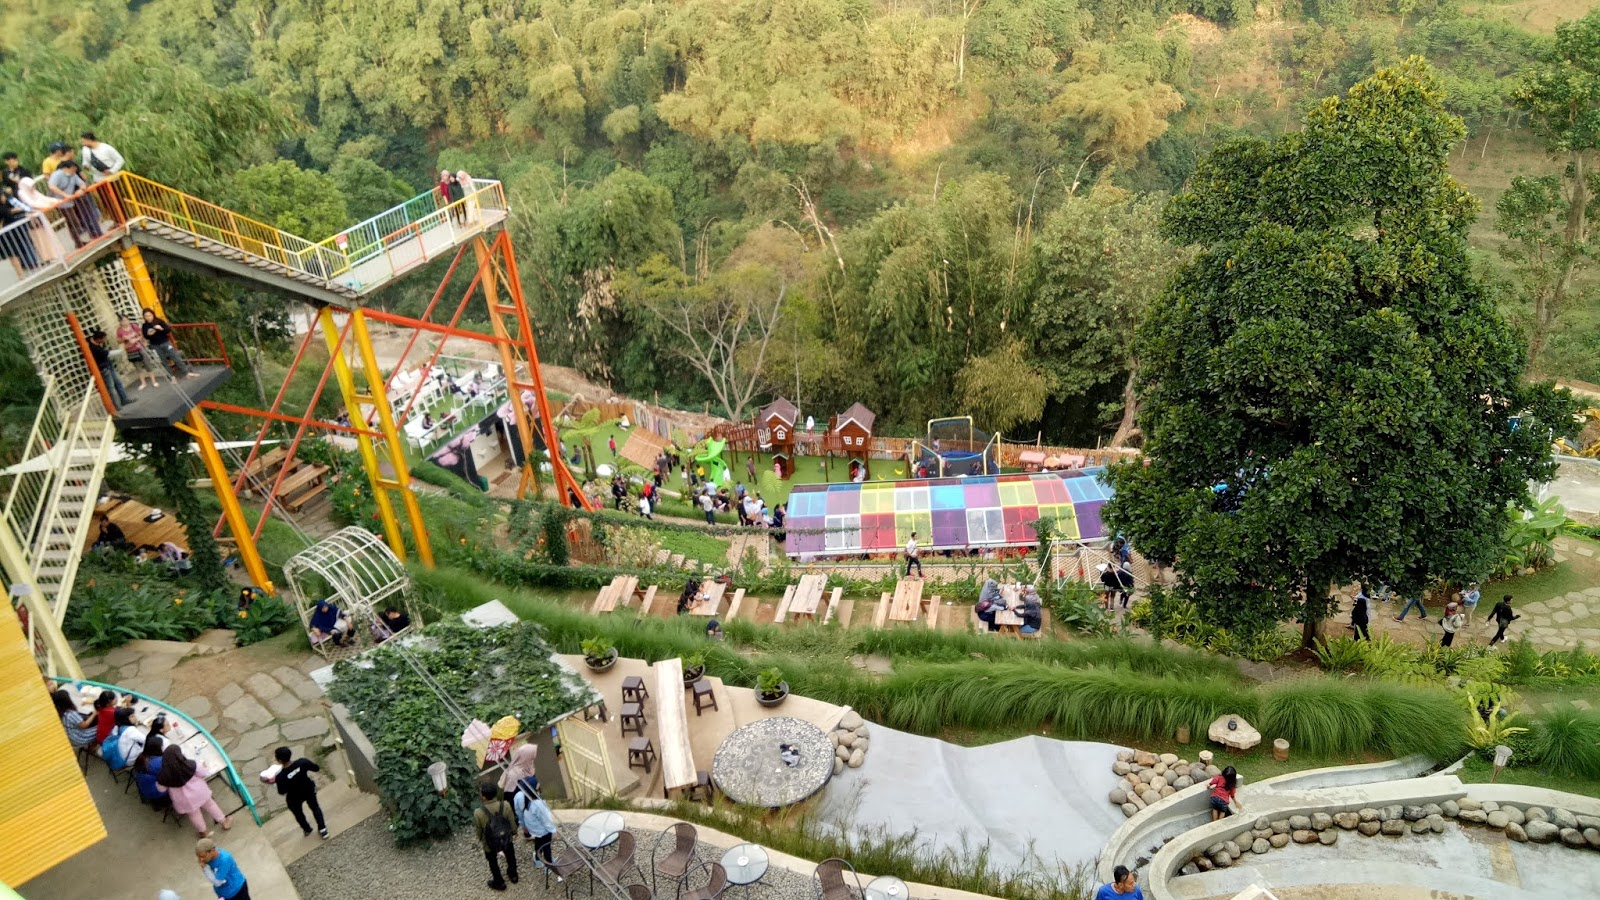 Wisata Bandung Yang Bikin Gagal Move On Jelajah Bahagia